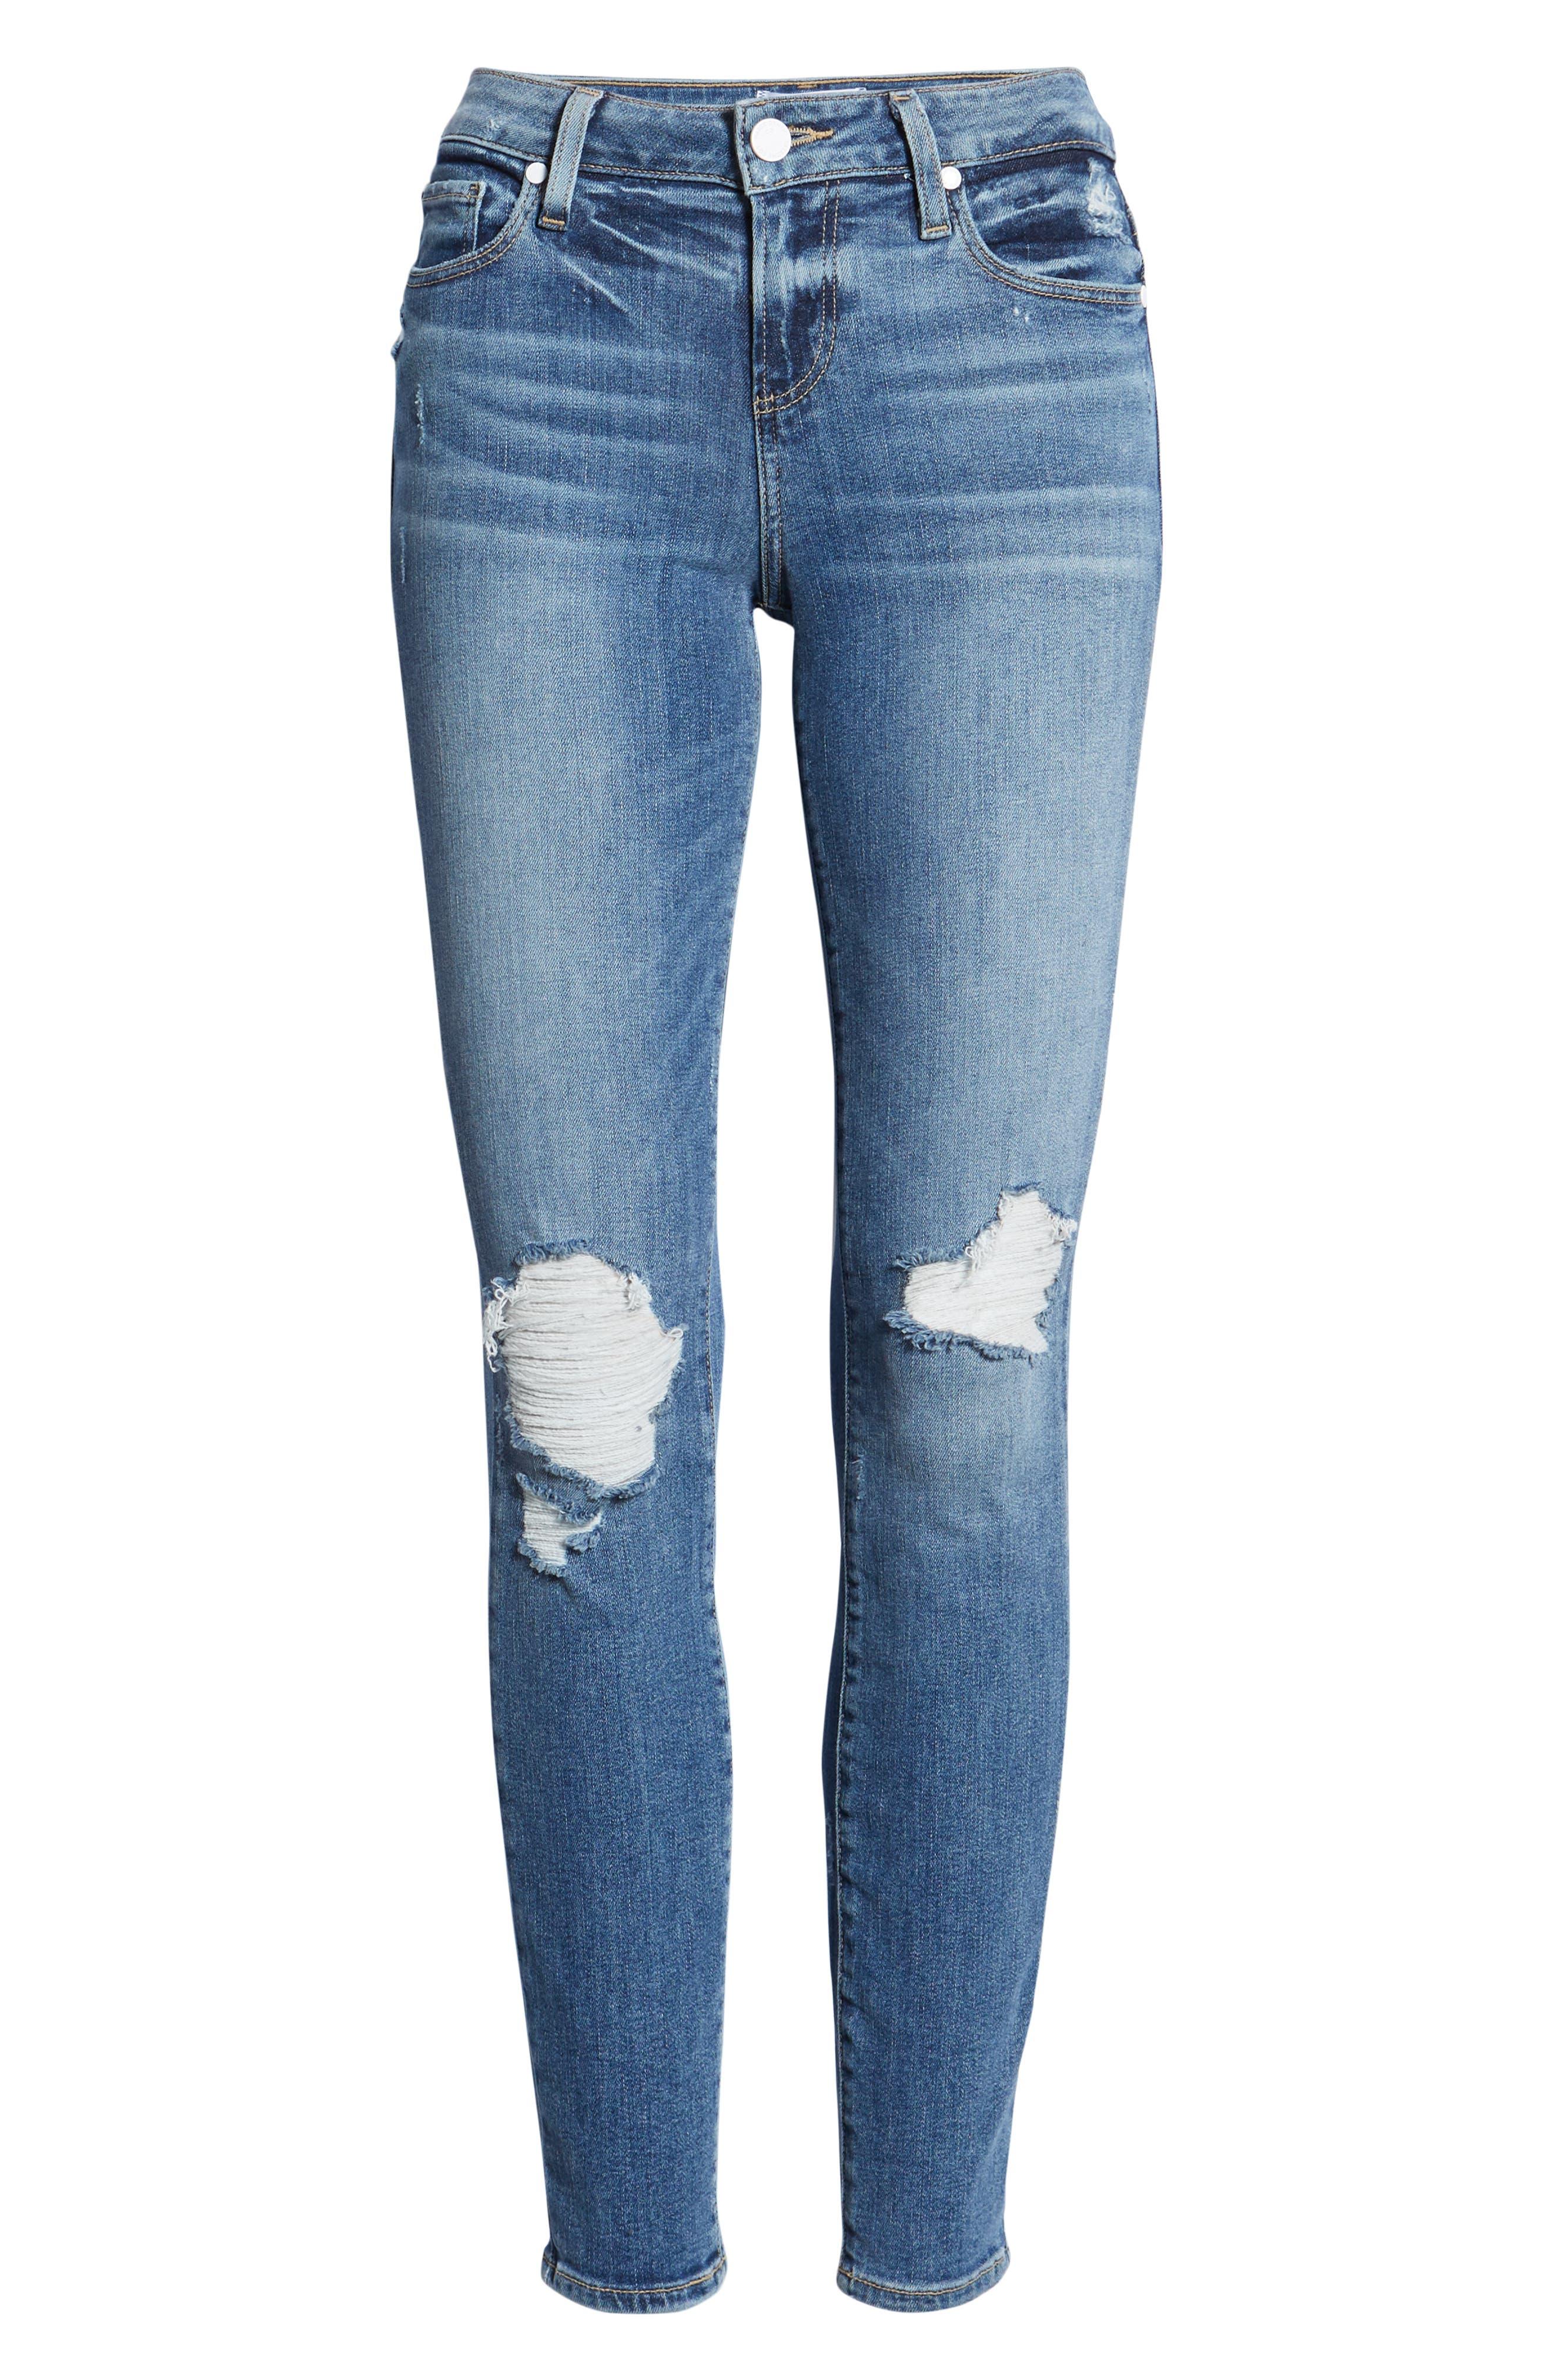 PAIGE, Verdugo Transcend Vintage Ripped Ankle Skinny Jeans, Alternate thumbnail 4, color, EMBARCADERO DESTRUCTED